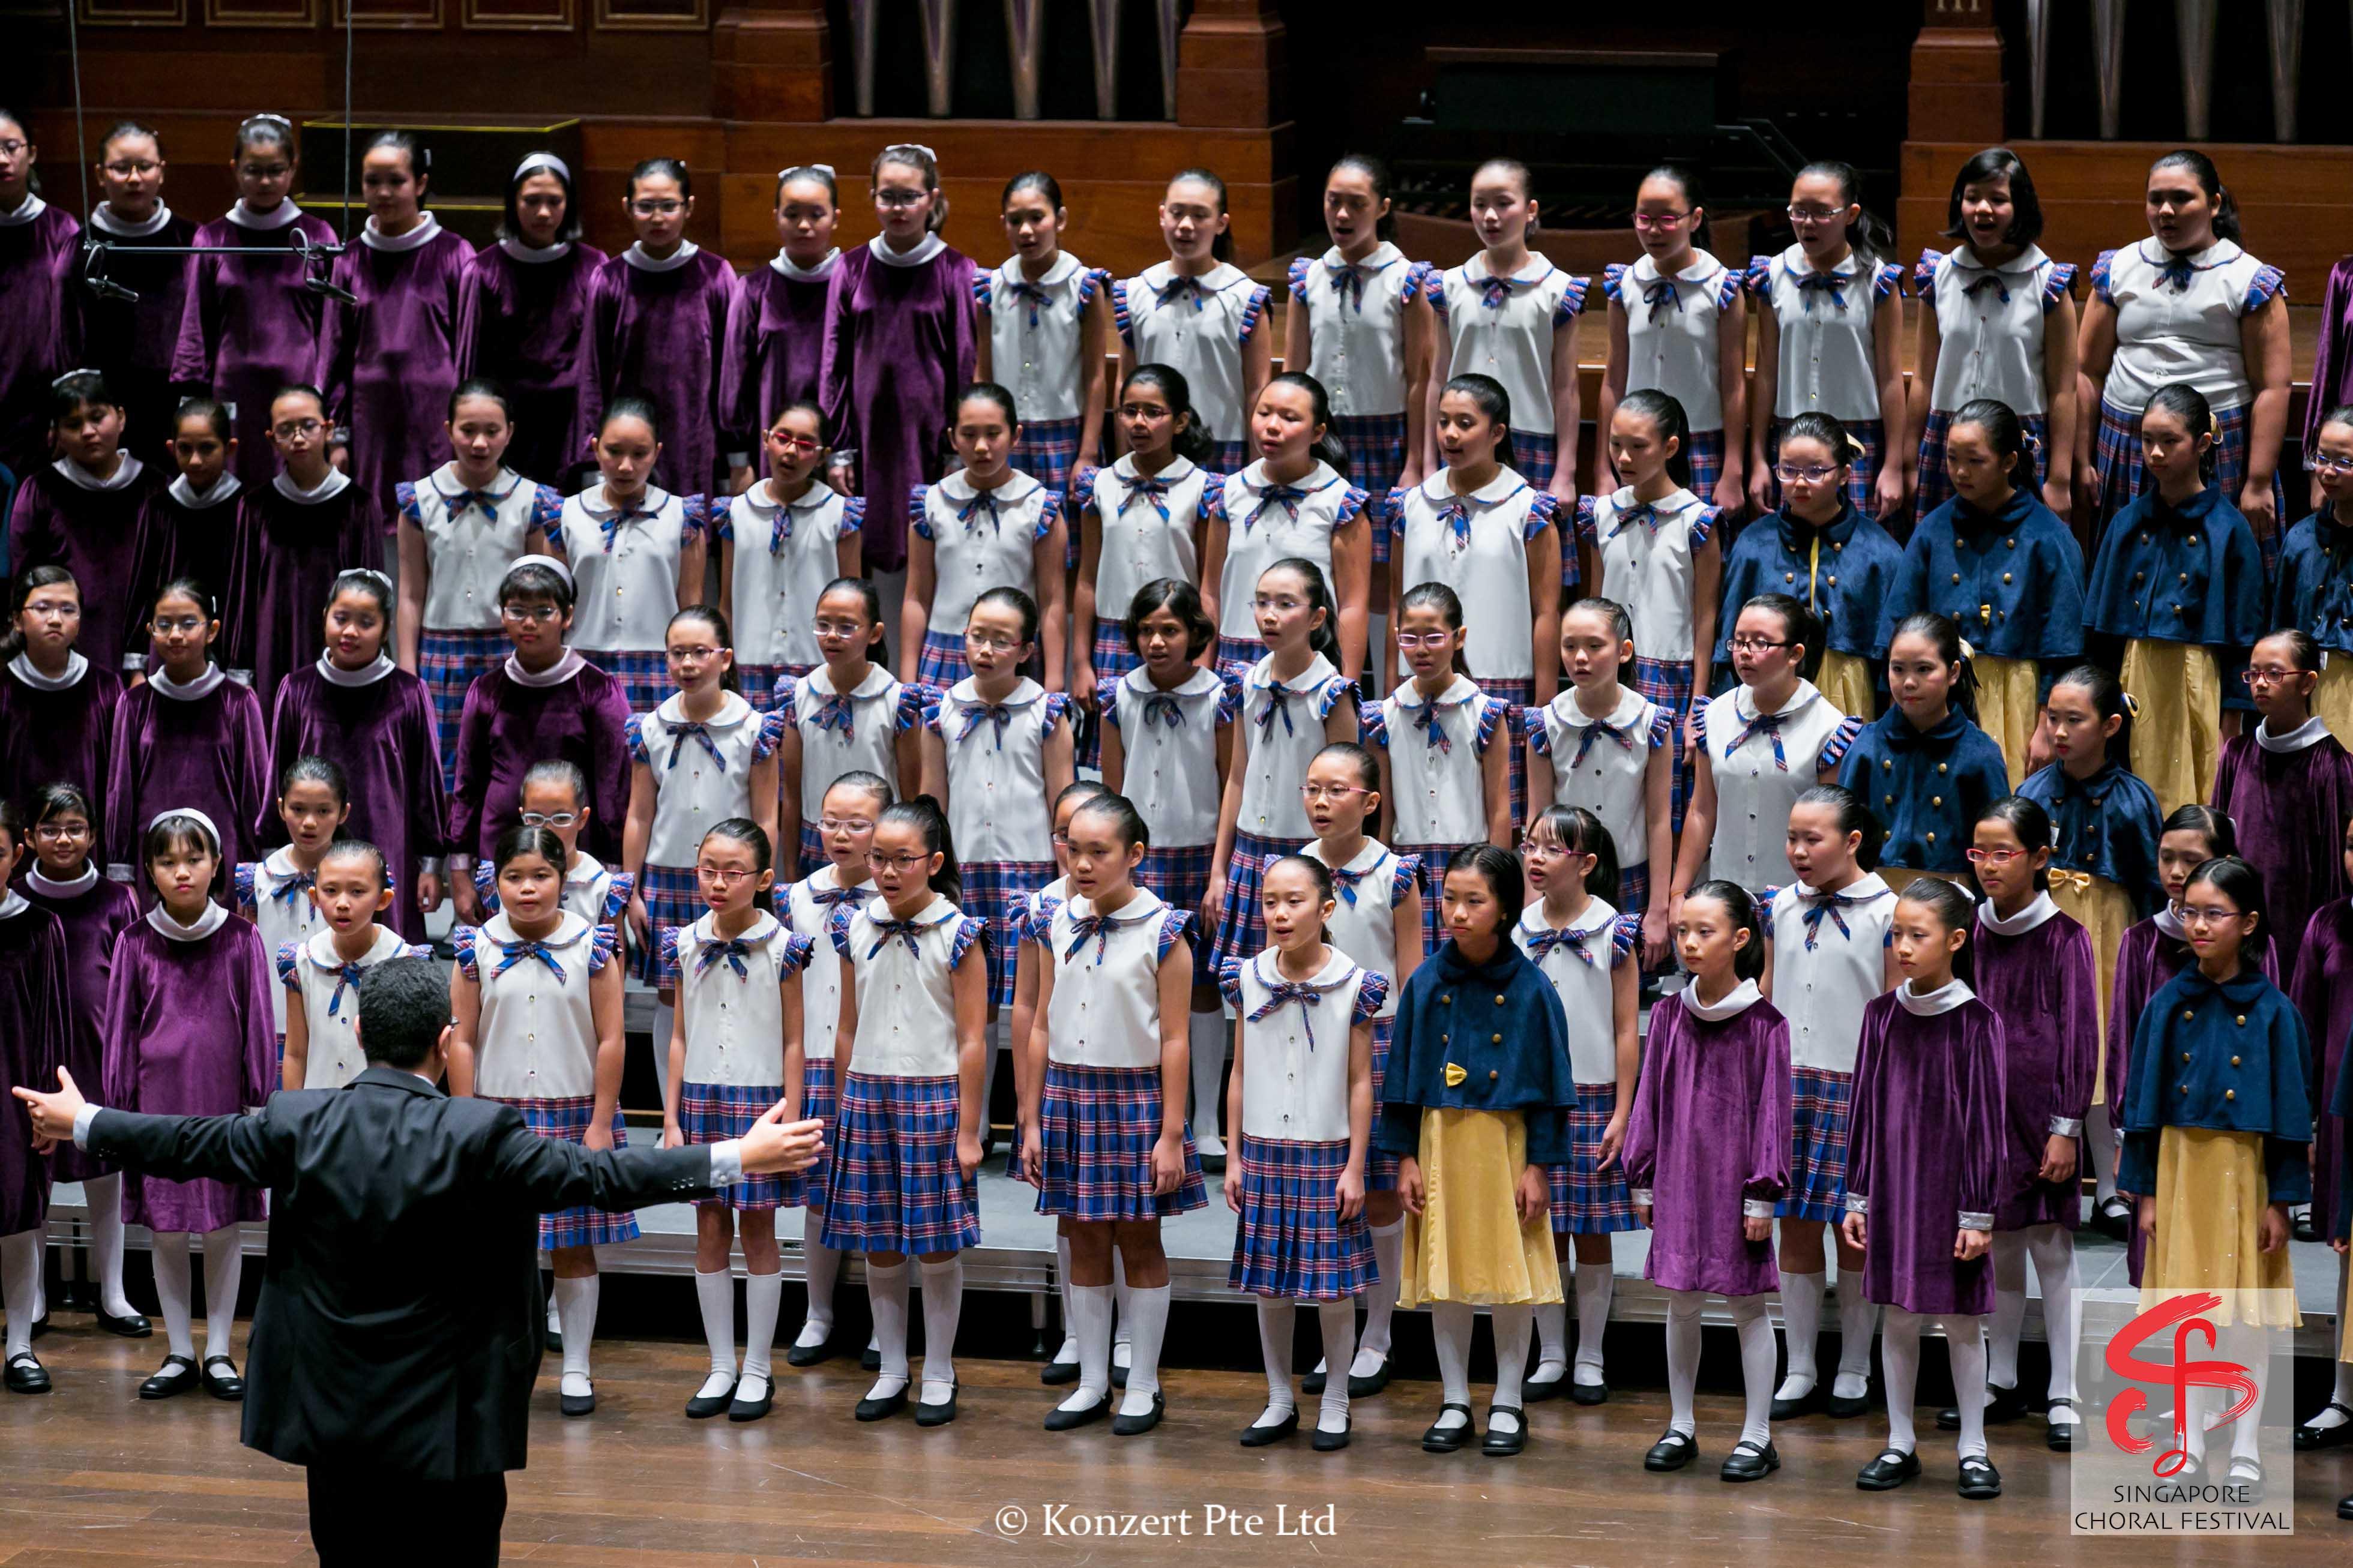 Singapore Choral Festival 8-8-15 (180).jpg